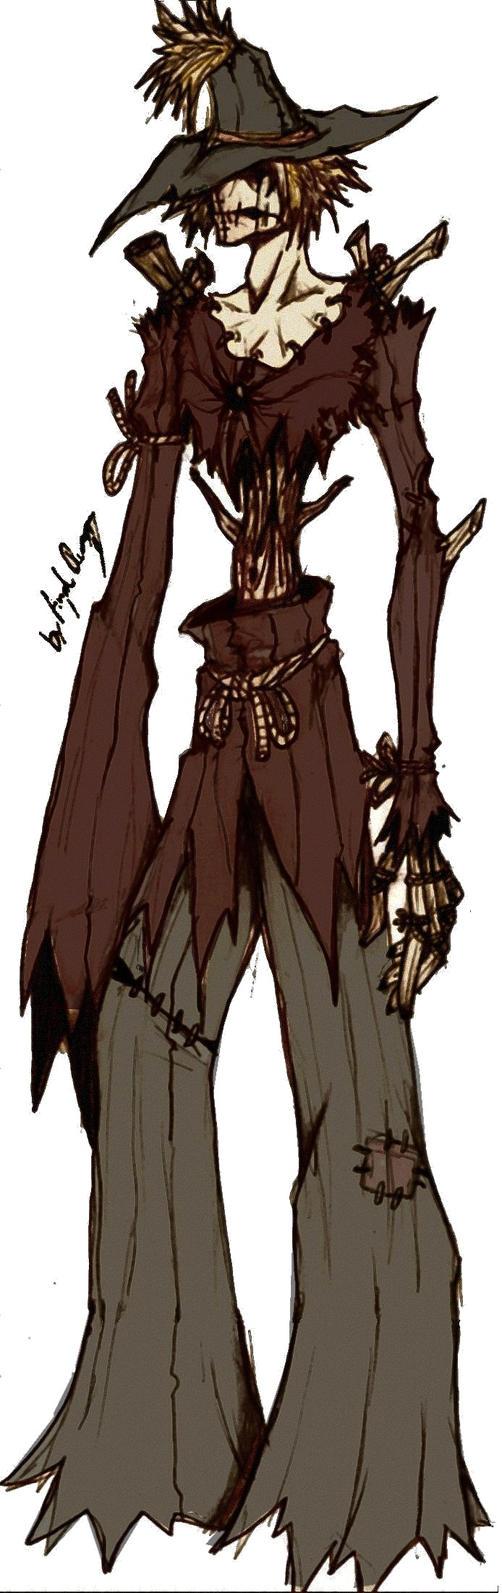 The Brainless Scarecrow Dark by MaverickTears on DeviantArt